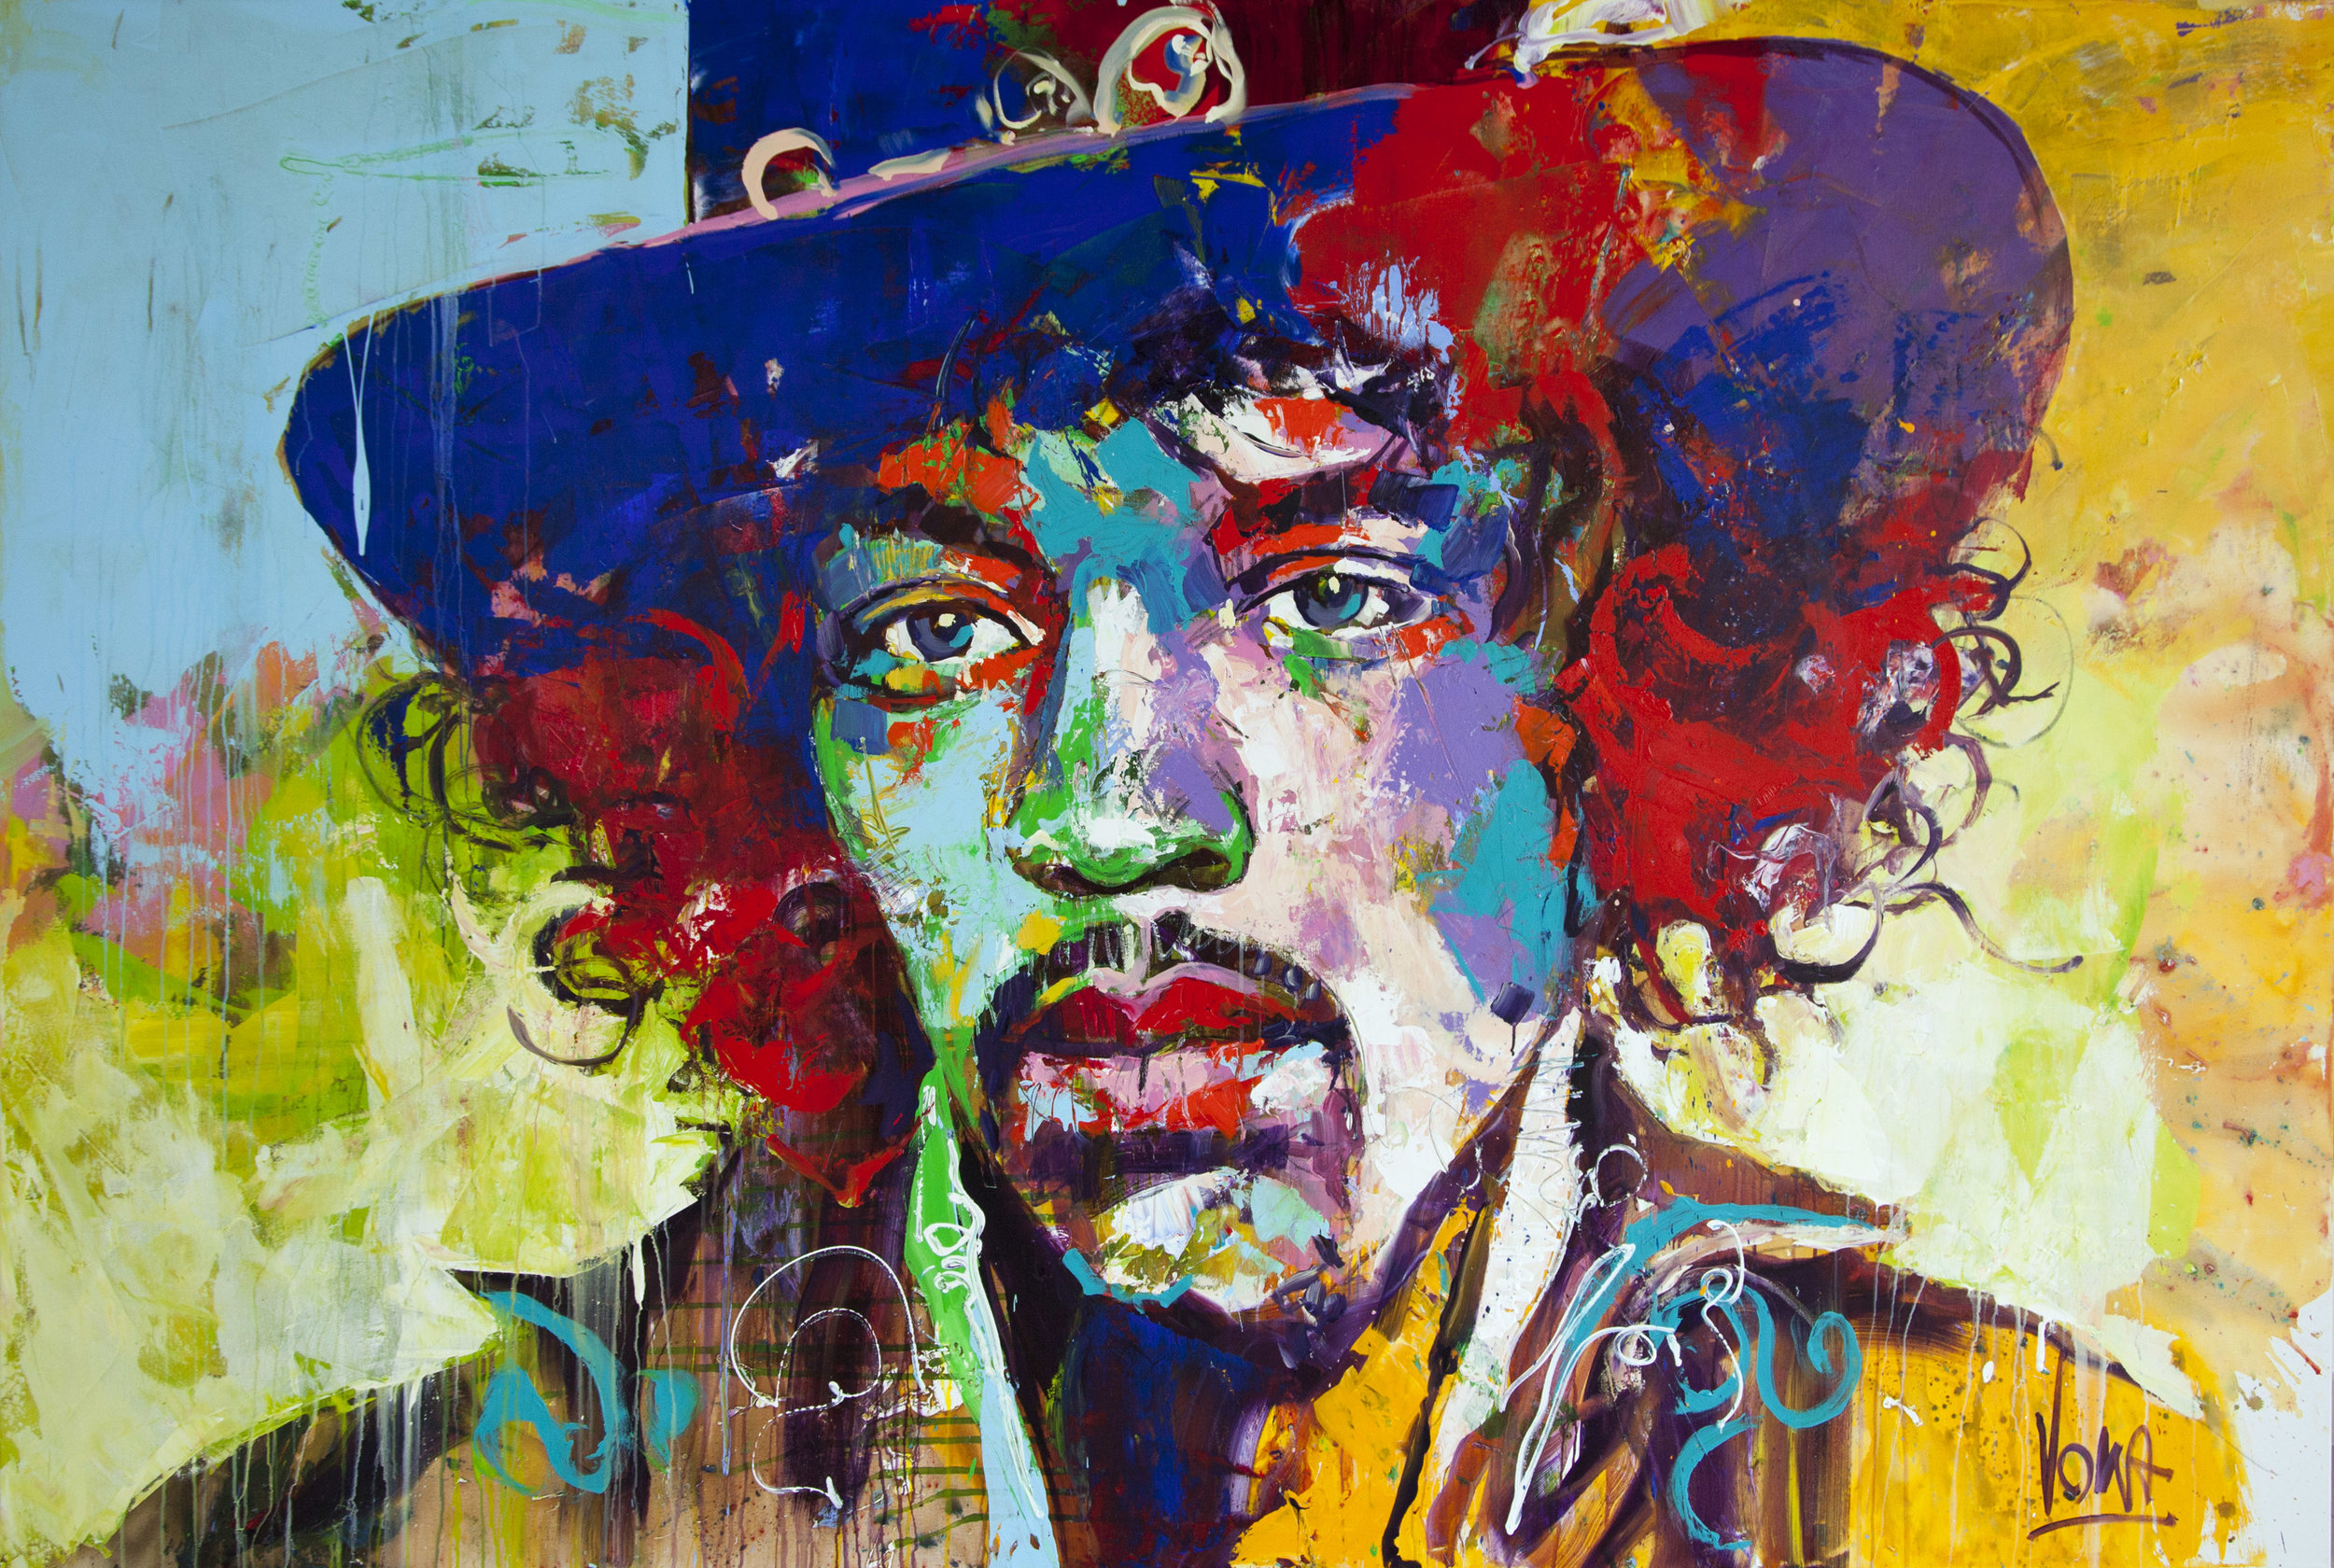 Jimi, 190x280 cm/74,8x110,2 inch, Acrylic on Canvas